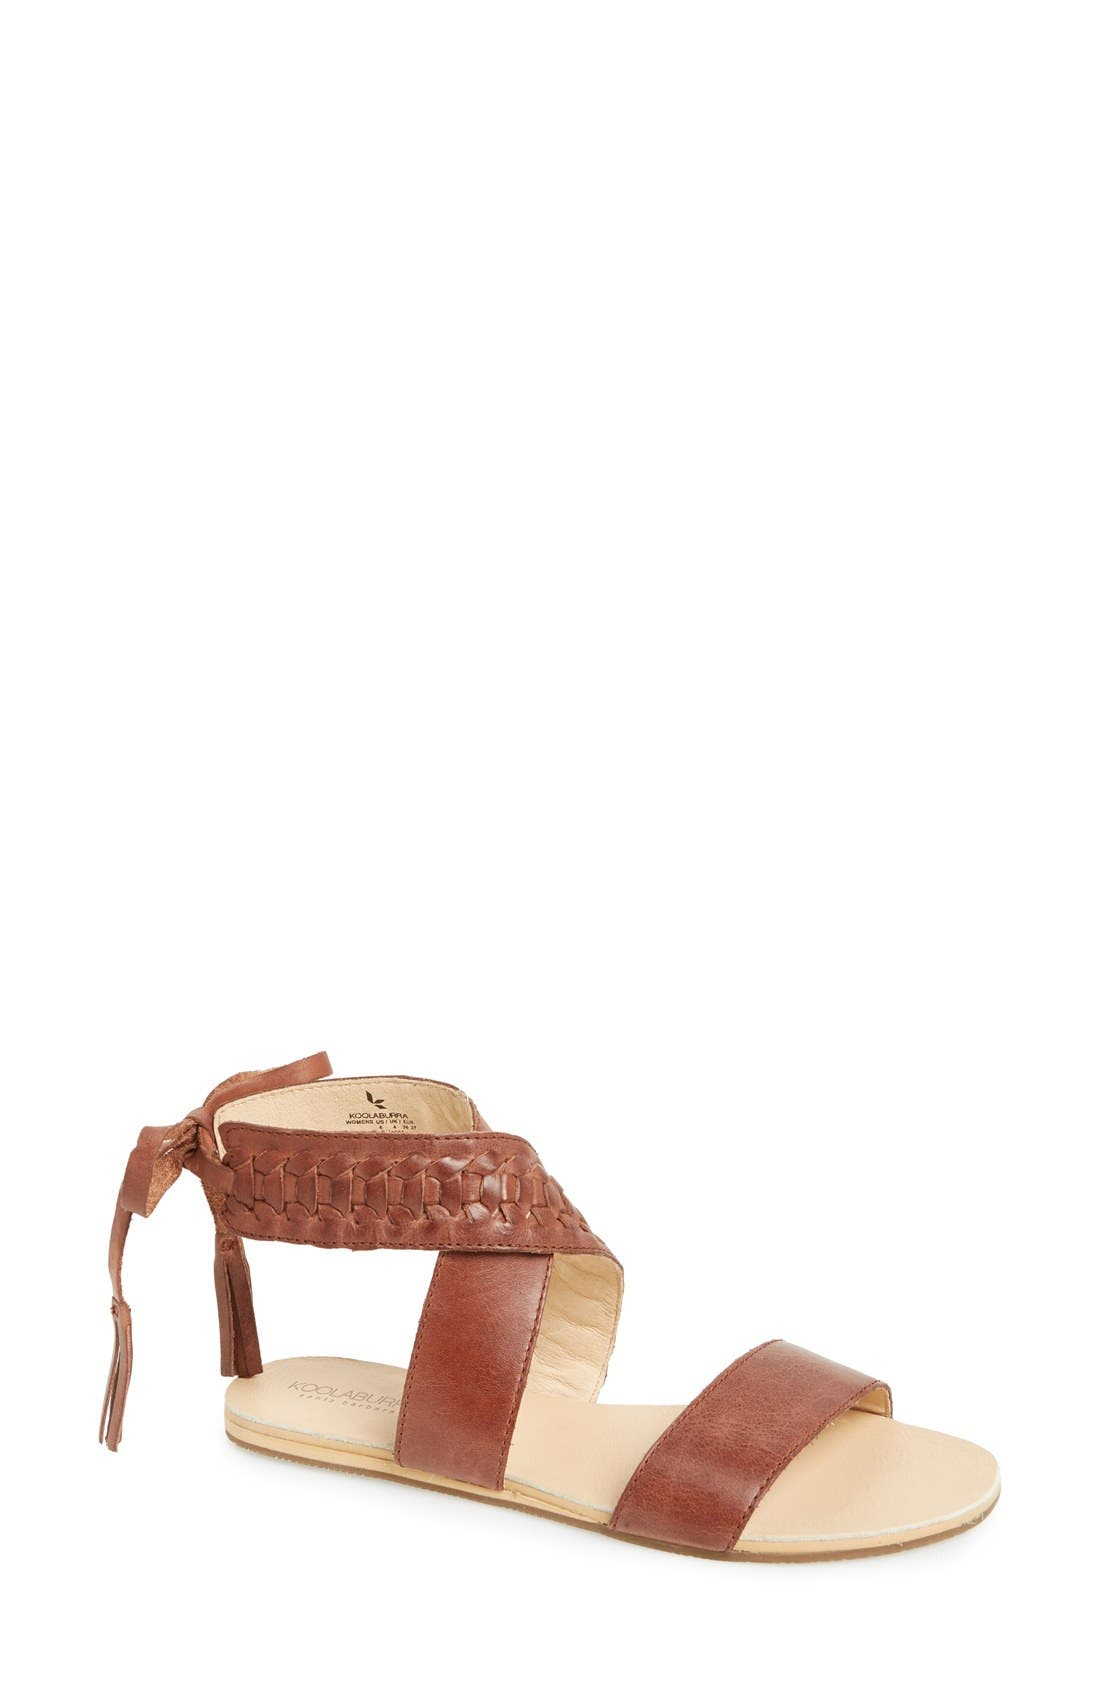 Main Image - Koolaburra 'Alexa' Leather Ankle Strap Sandal (Women)